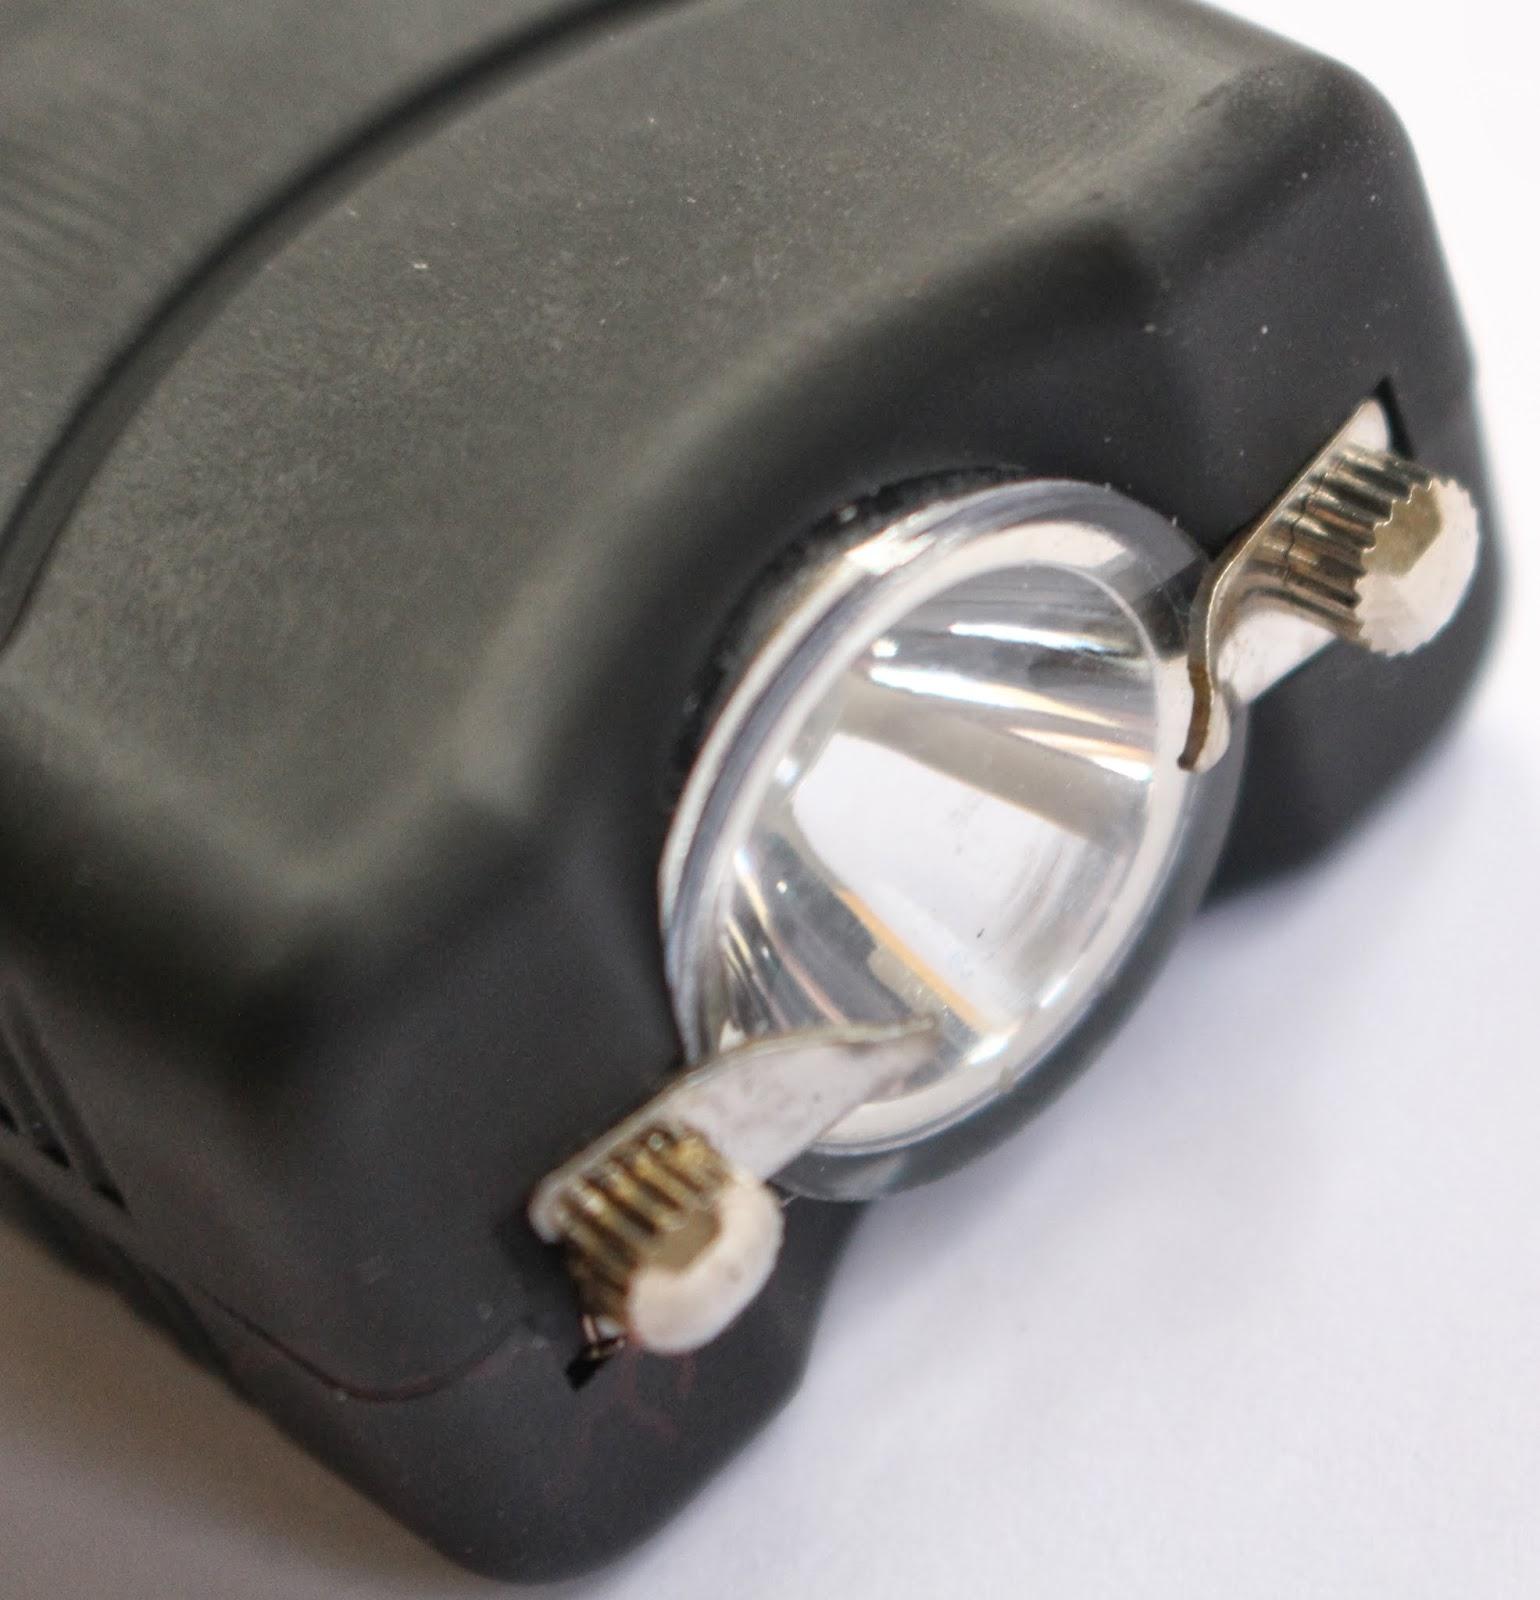 Vipertek VTS-881 Closeup Of Electrical Prongs